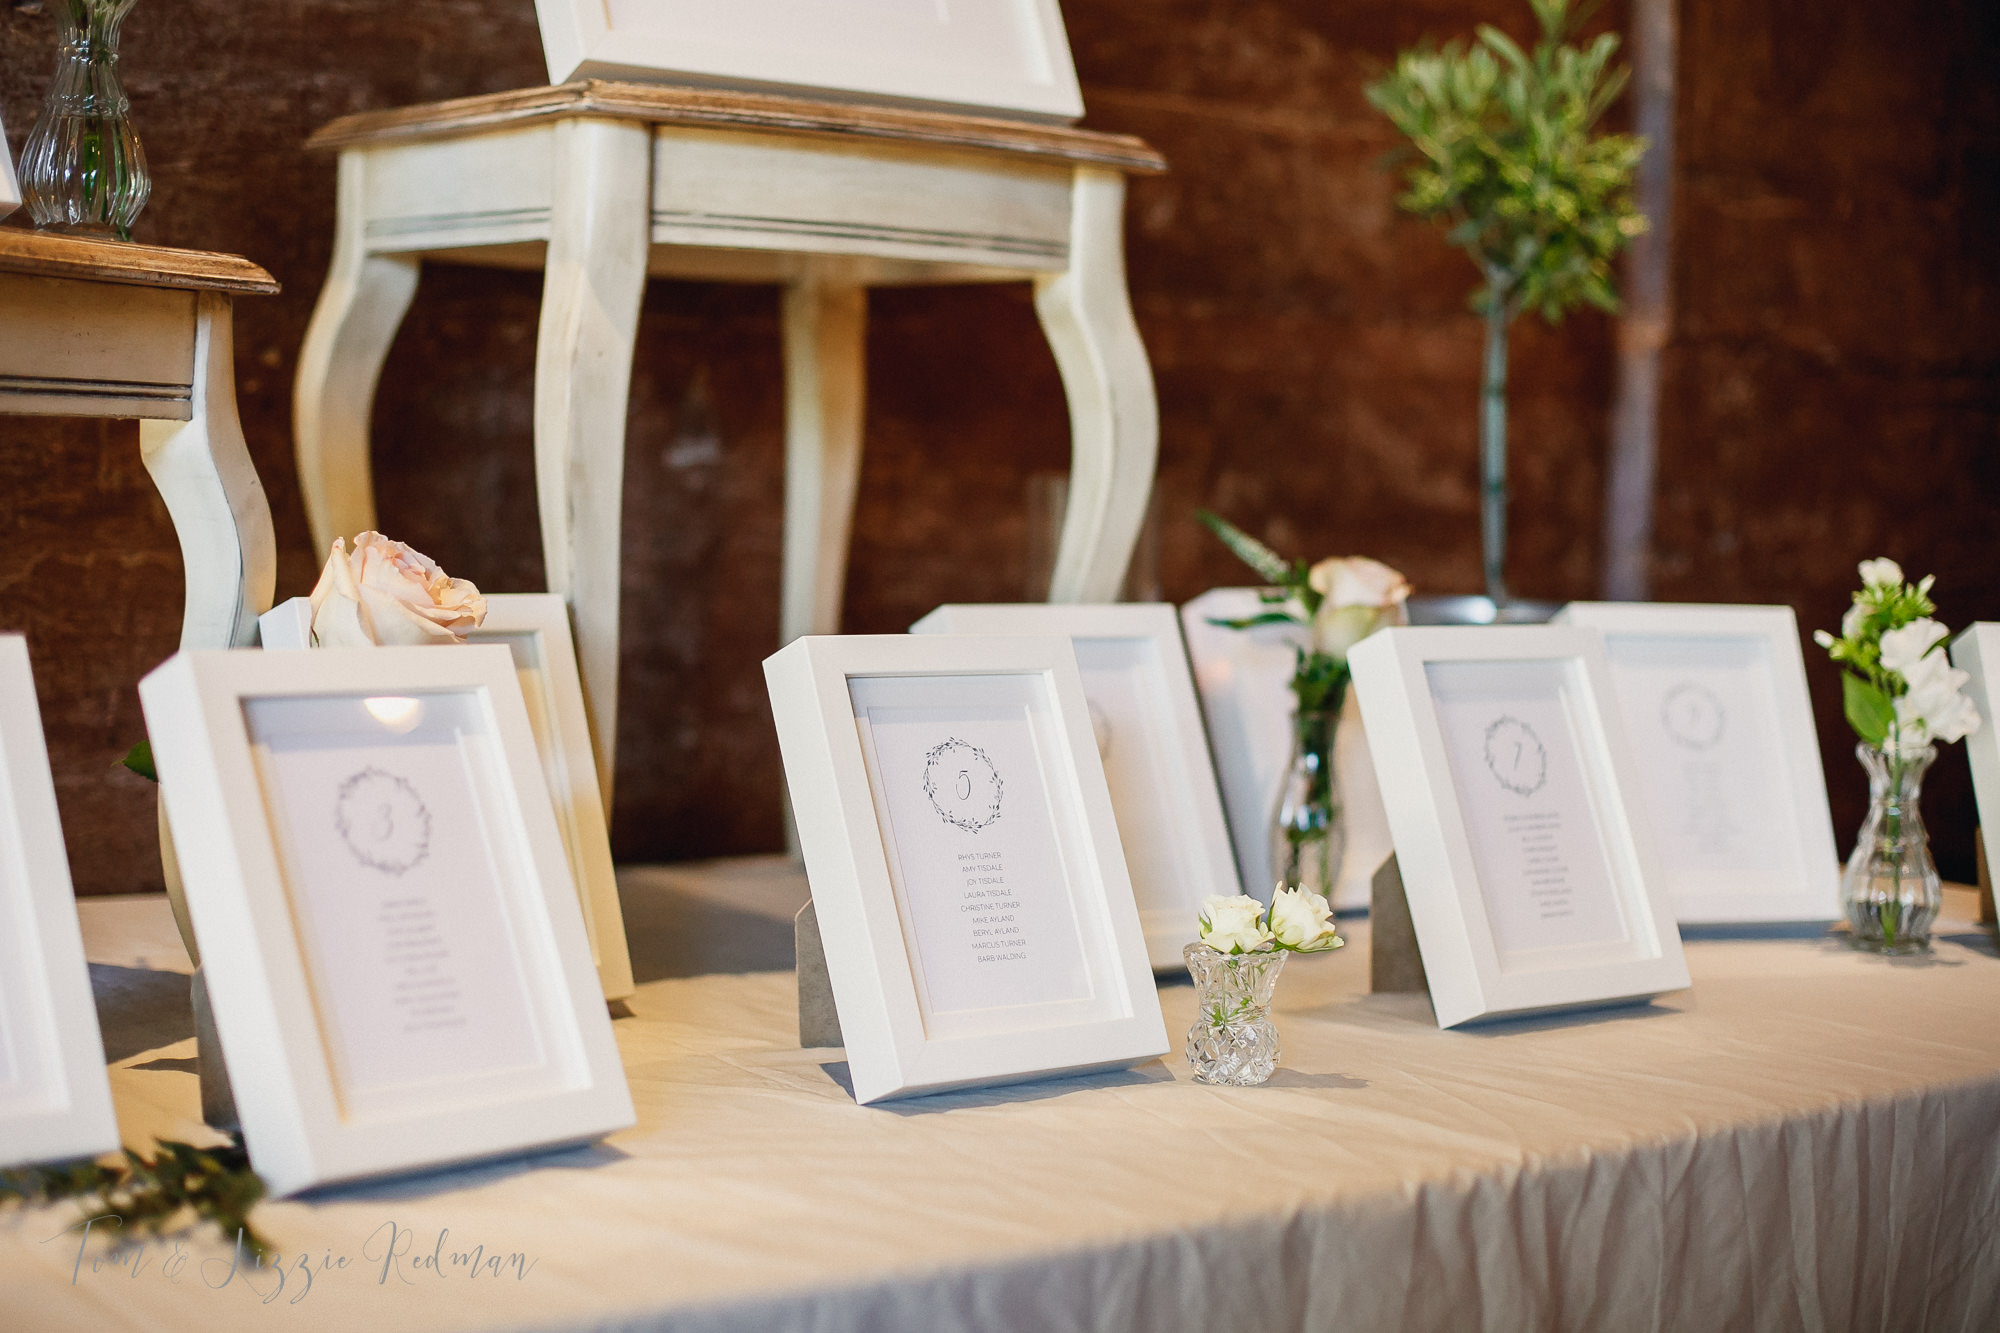 Dorset wedding photographers Tom & Lizzie Redman 040.jpg